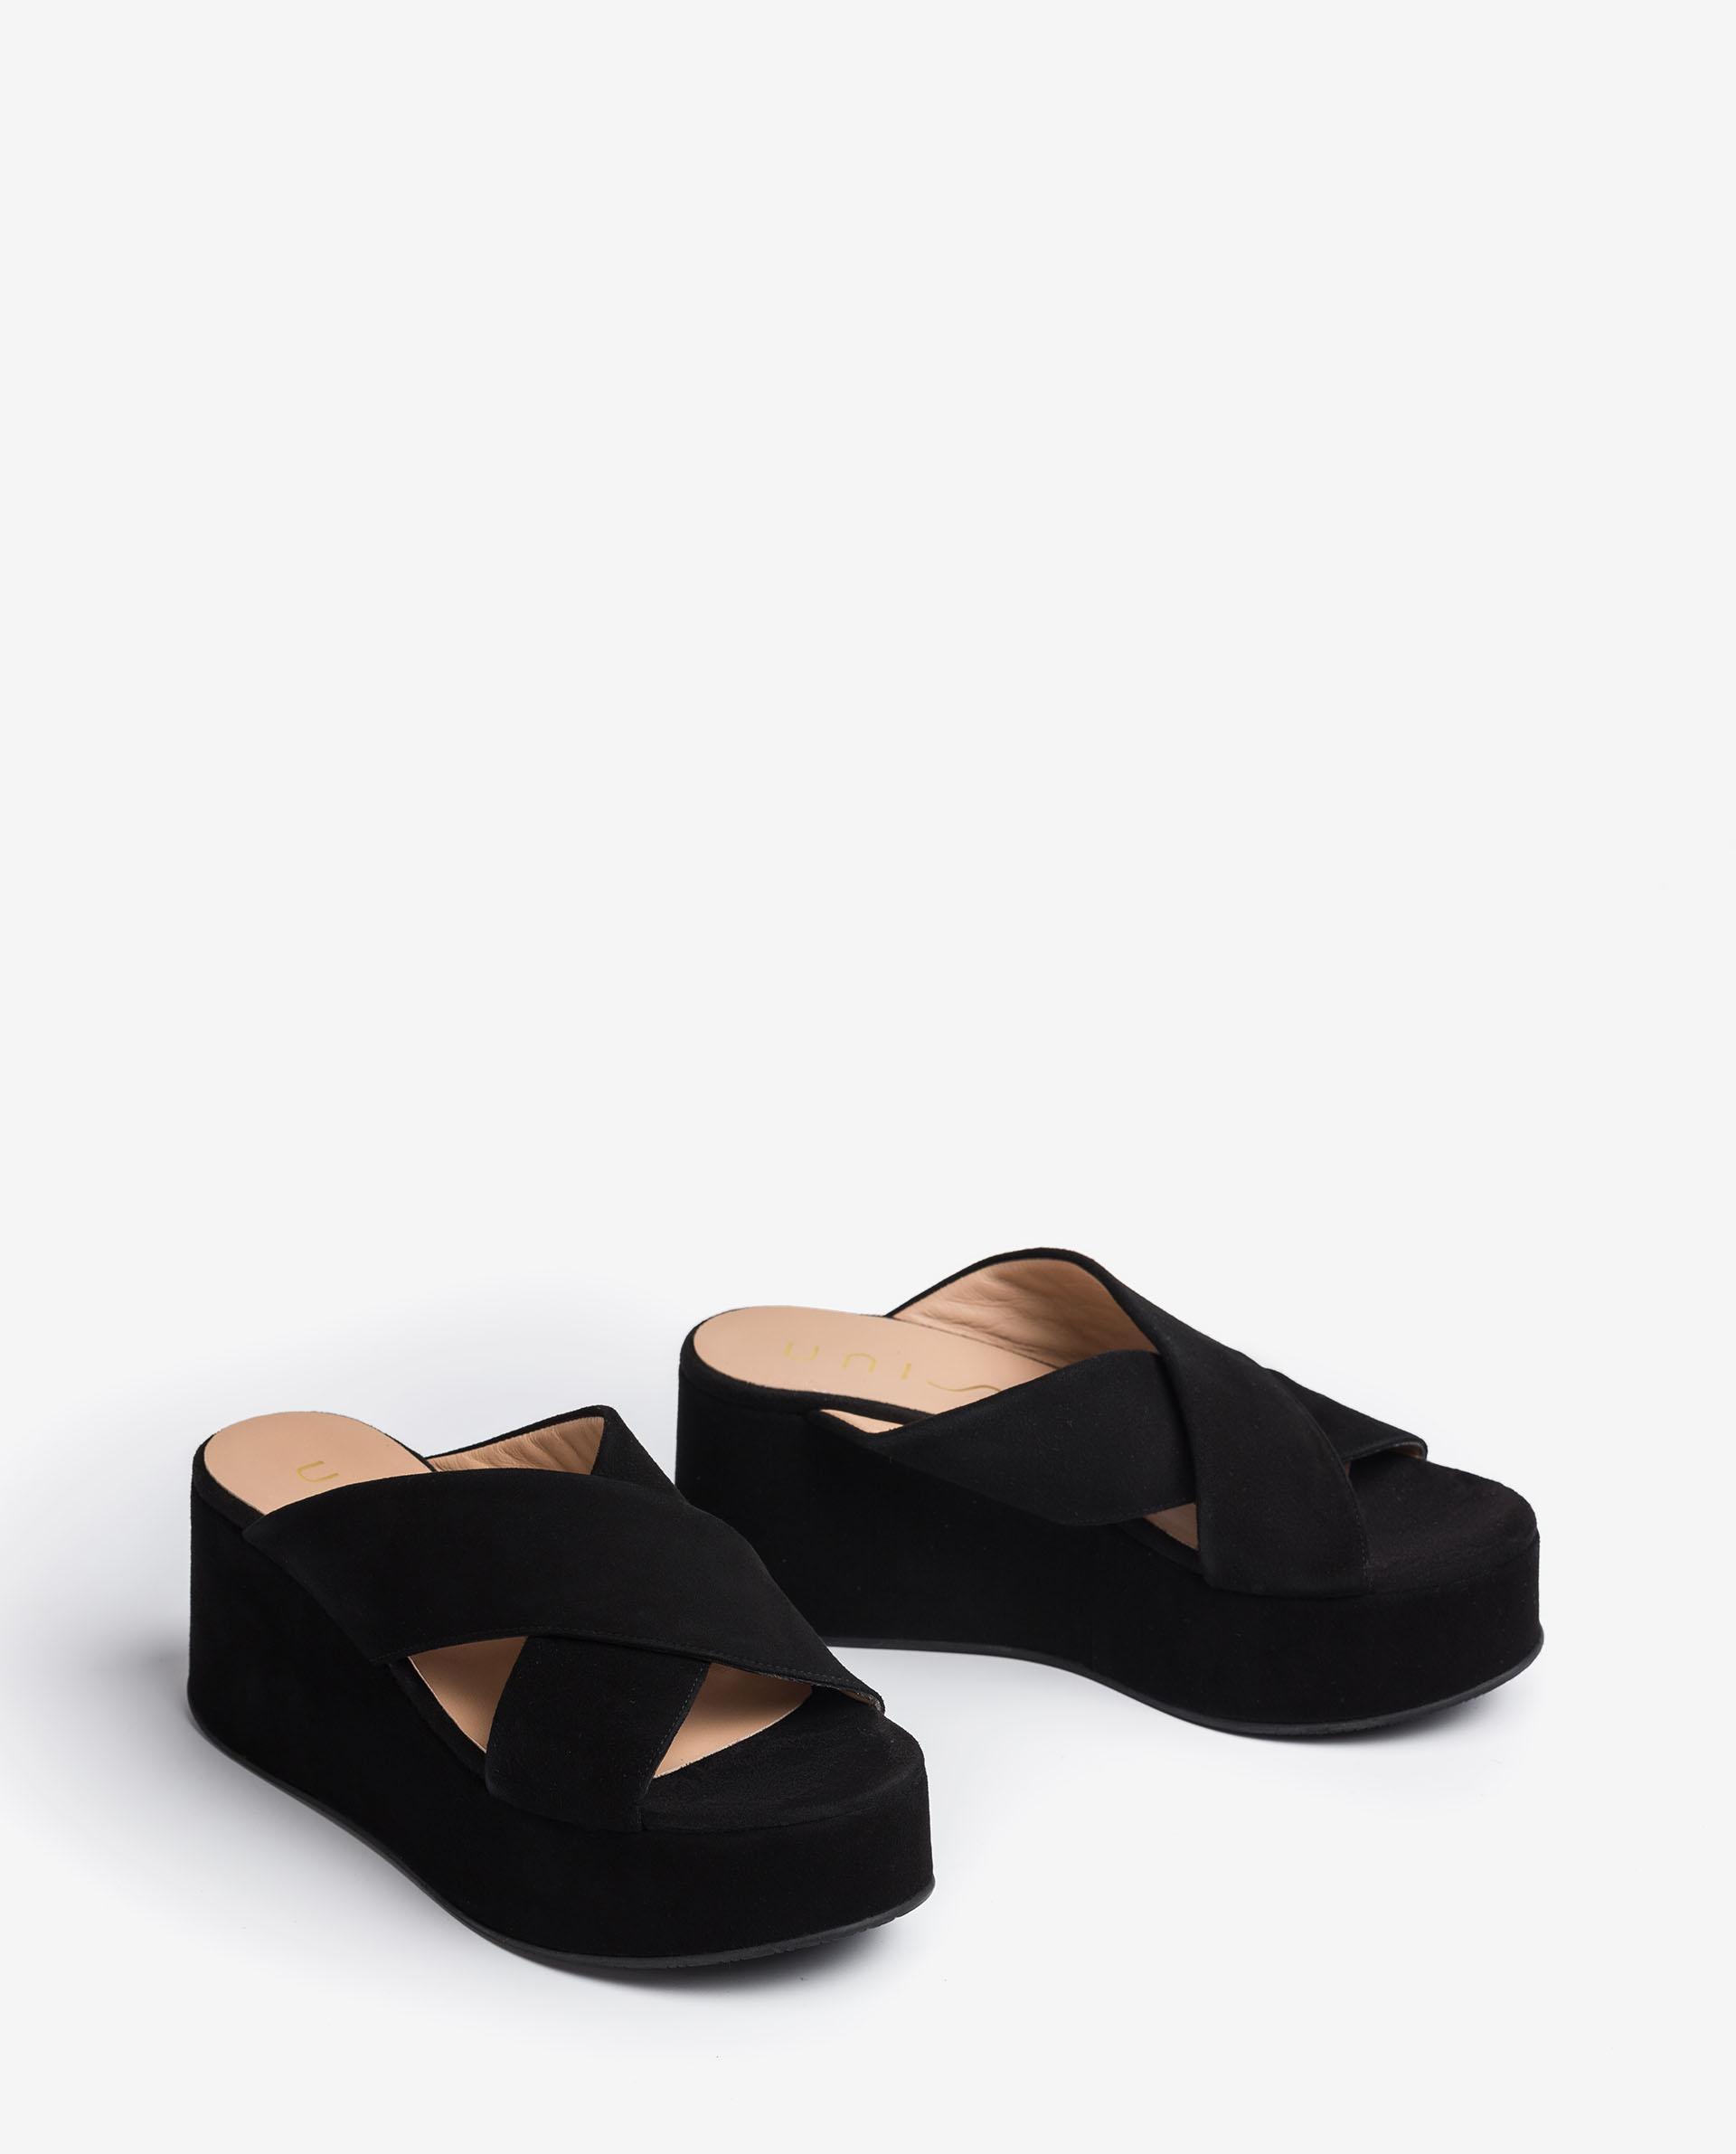 UNISA Kid suede straps sandals with wide wedge LADIN_KS 2